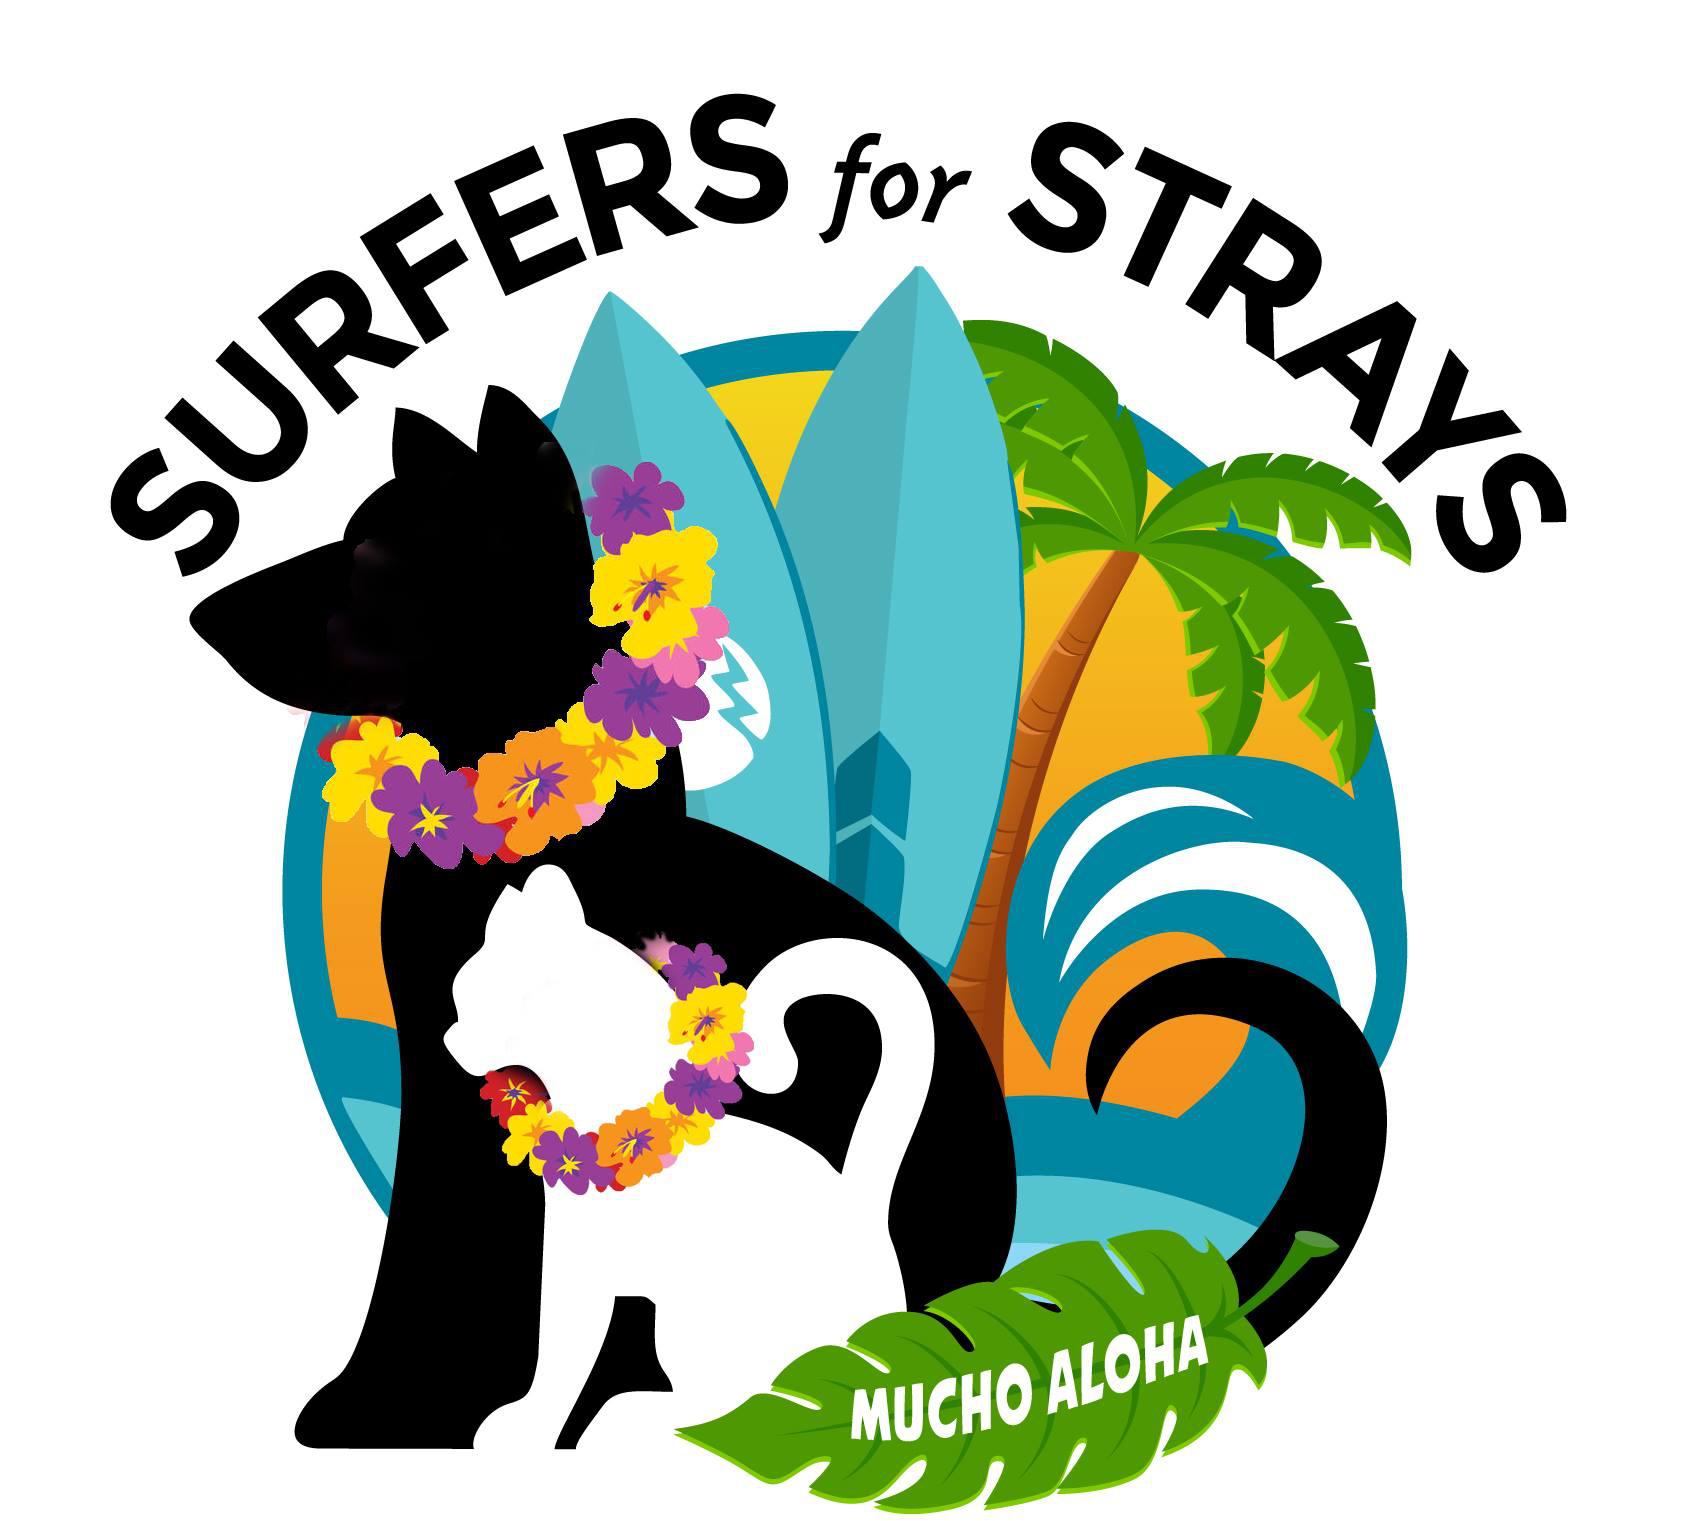 SurfersforStraysLogo.png